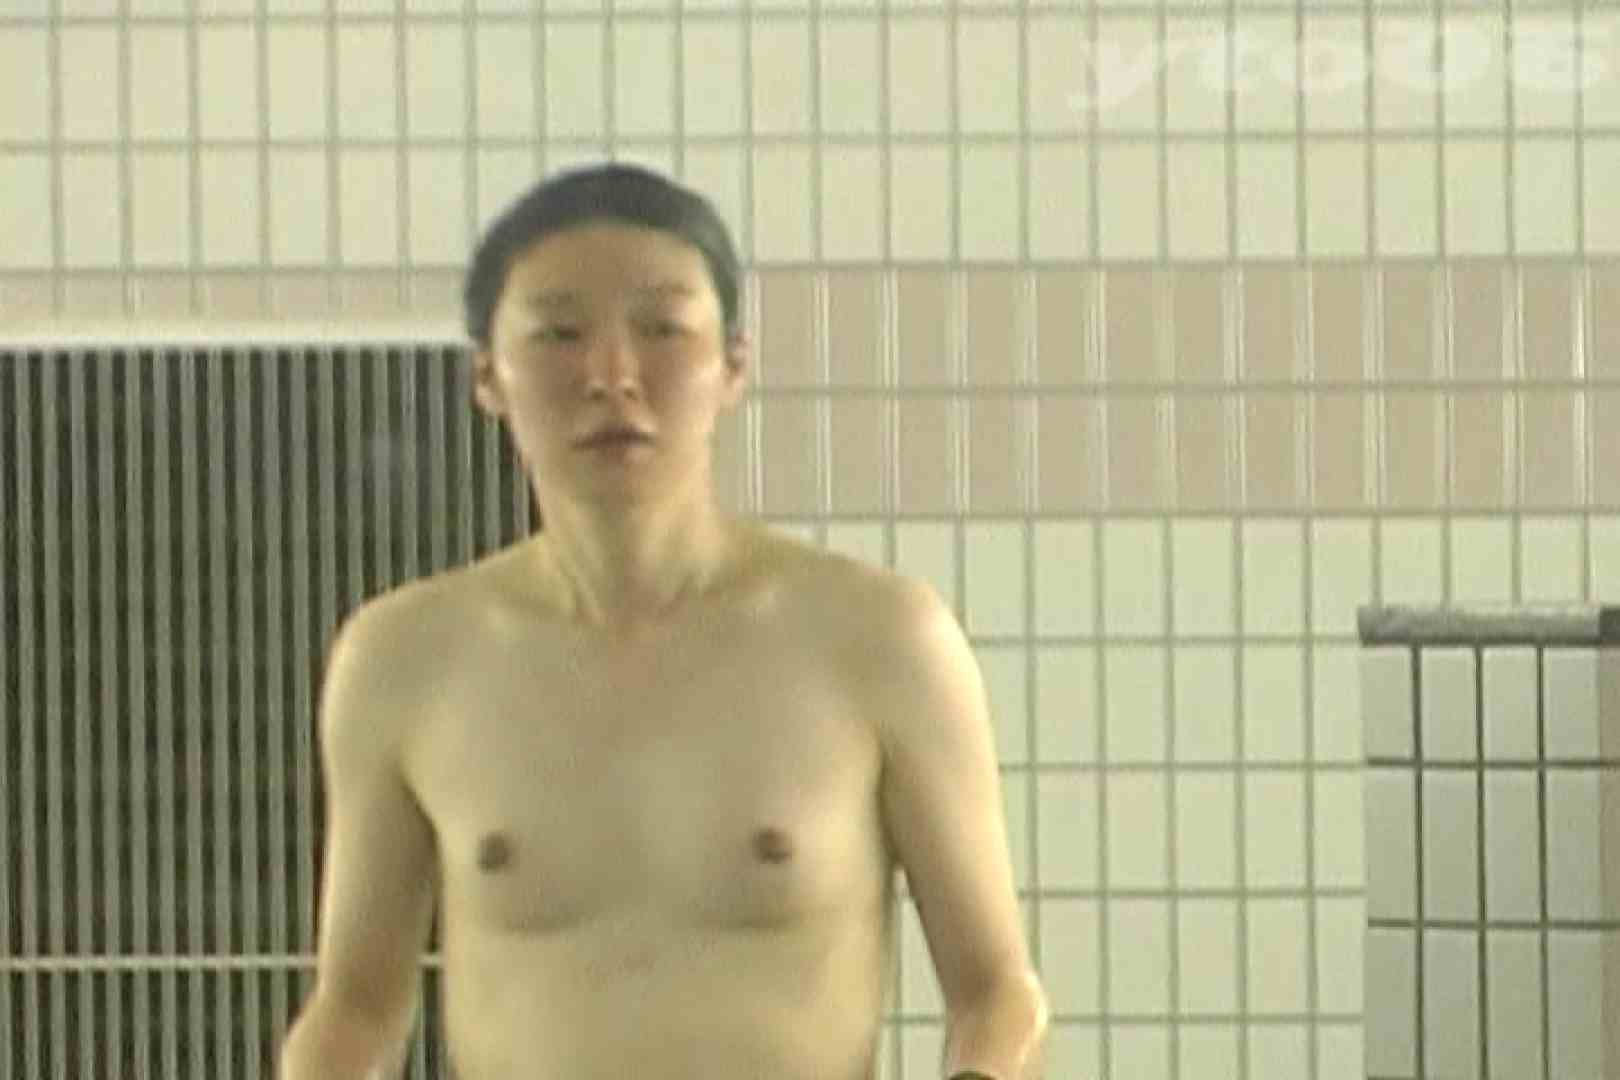 ▲復活限定▲合宿ホテル女風呂盗撮 Vol.36 女風呂 セックス無修正動画無料 113画像 110